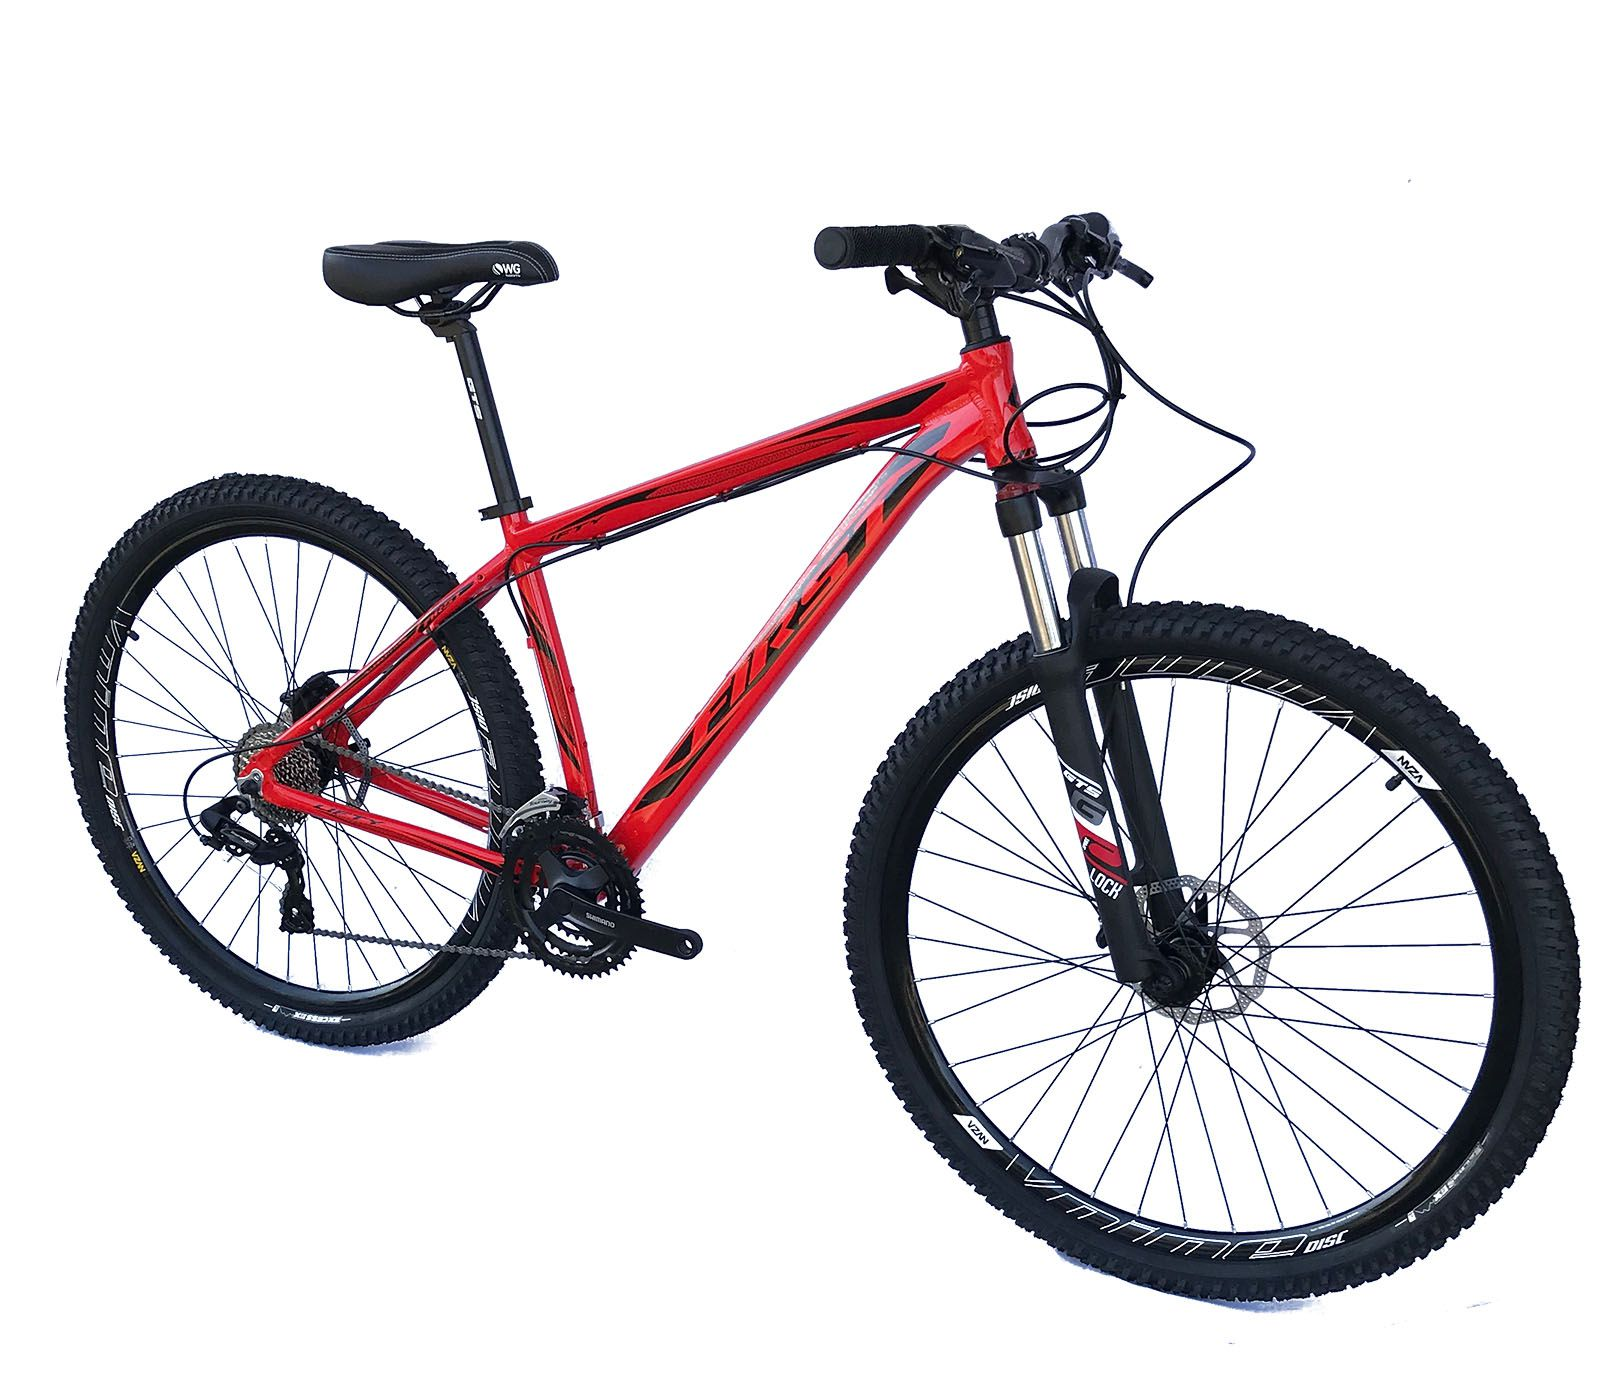 Bicicleta Aro 29 Lifty First 24v Shimano Freio Hidraulico Susp c/ Trava Ombro